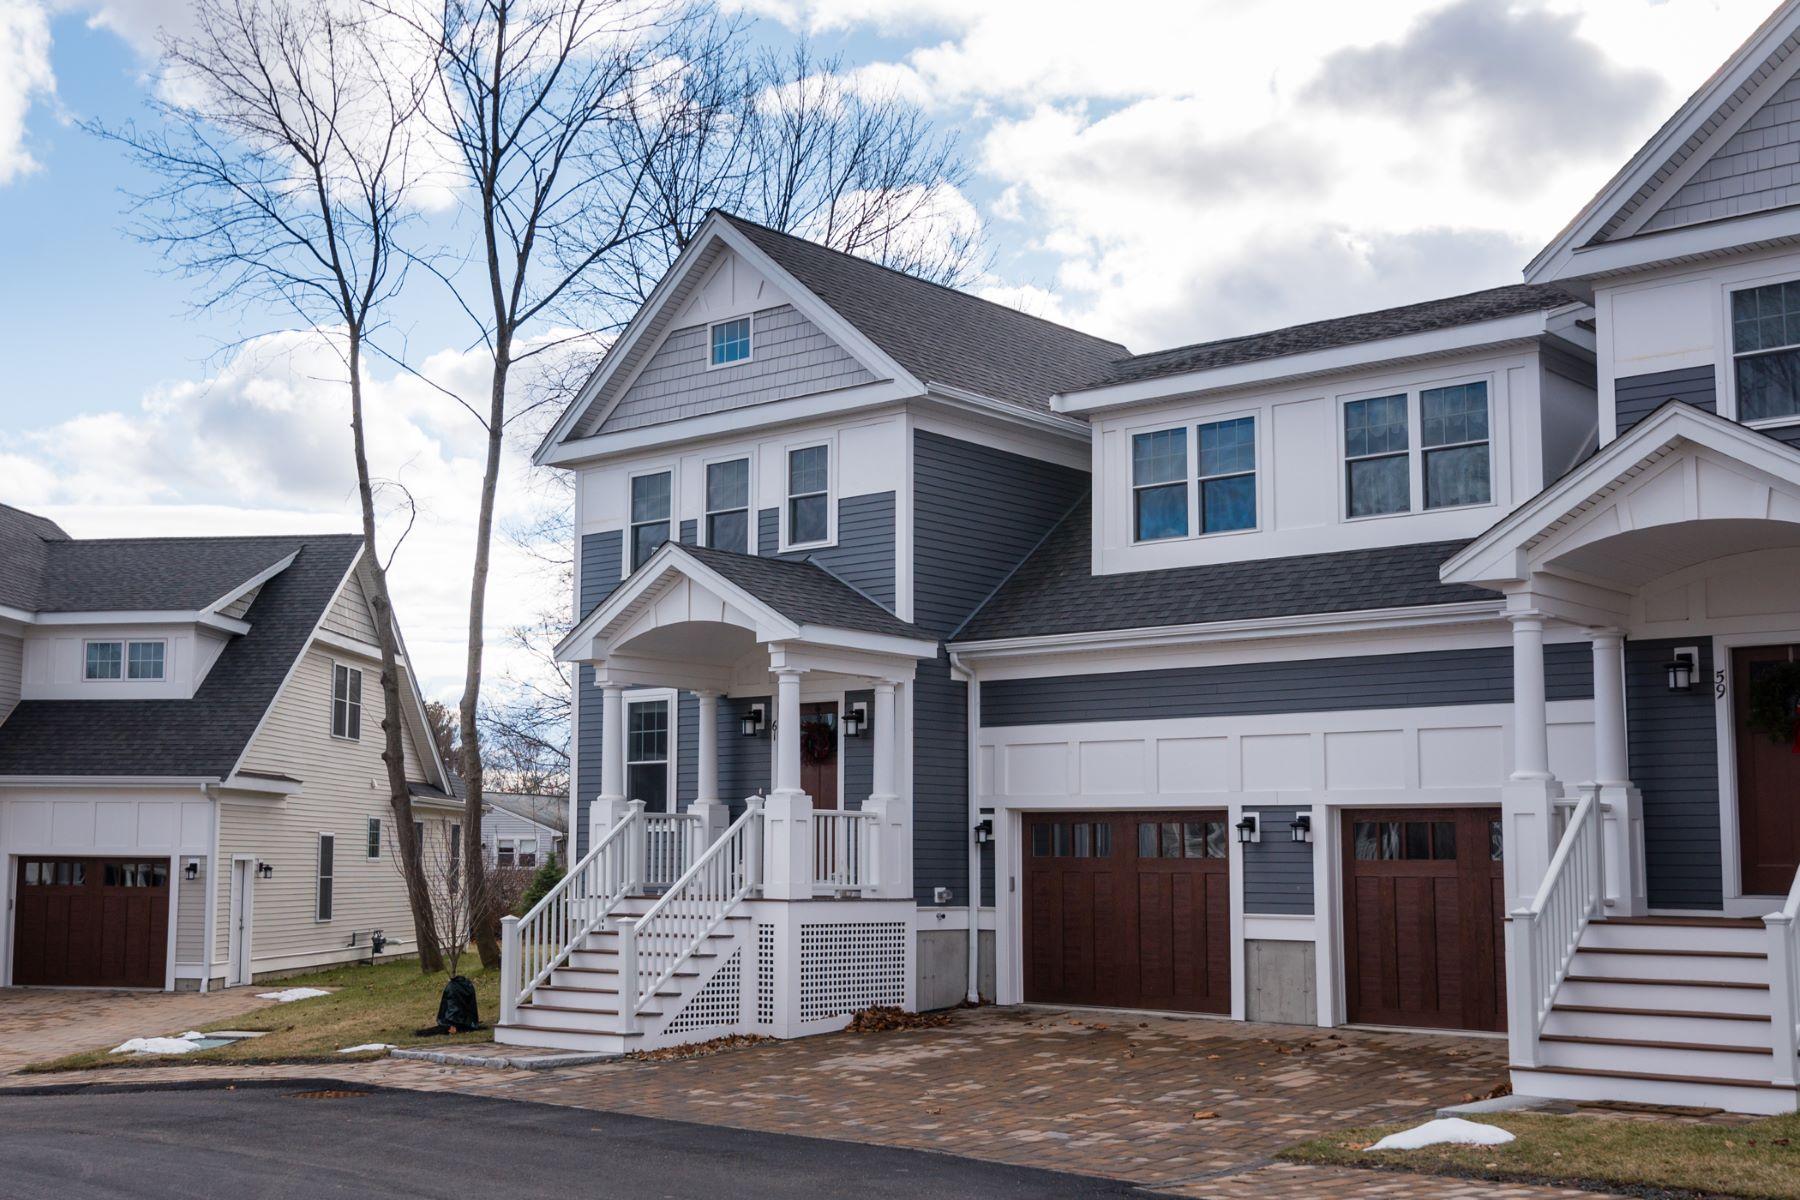 Condominiums για την Πώληση στο 61 Evergreen Ave 12, Bedford, Μασαχουσετη 01730 Ηνωμένες Πολιτείες